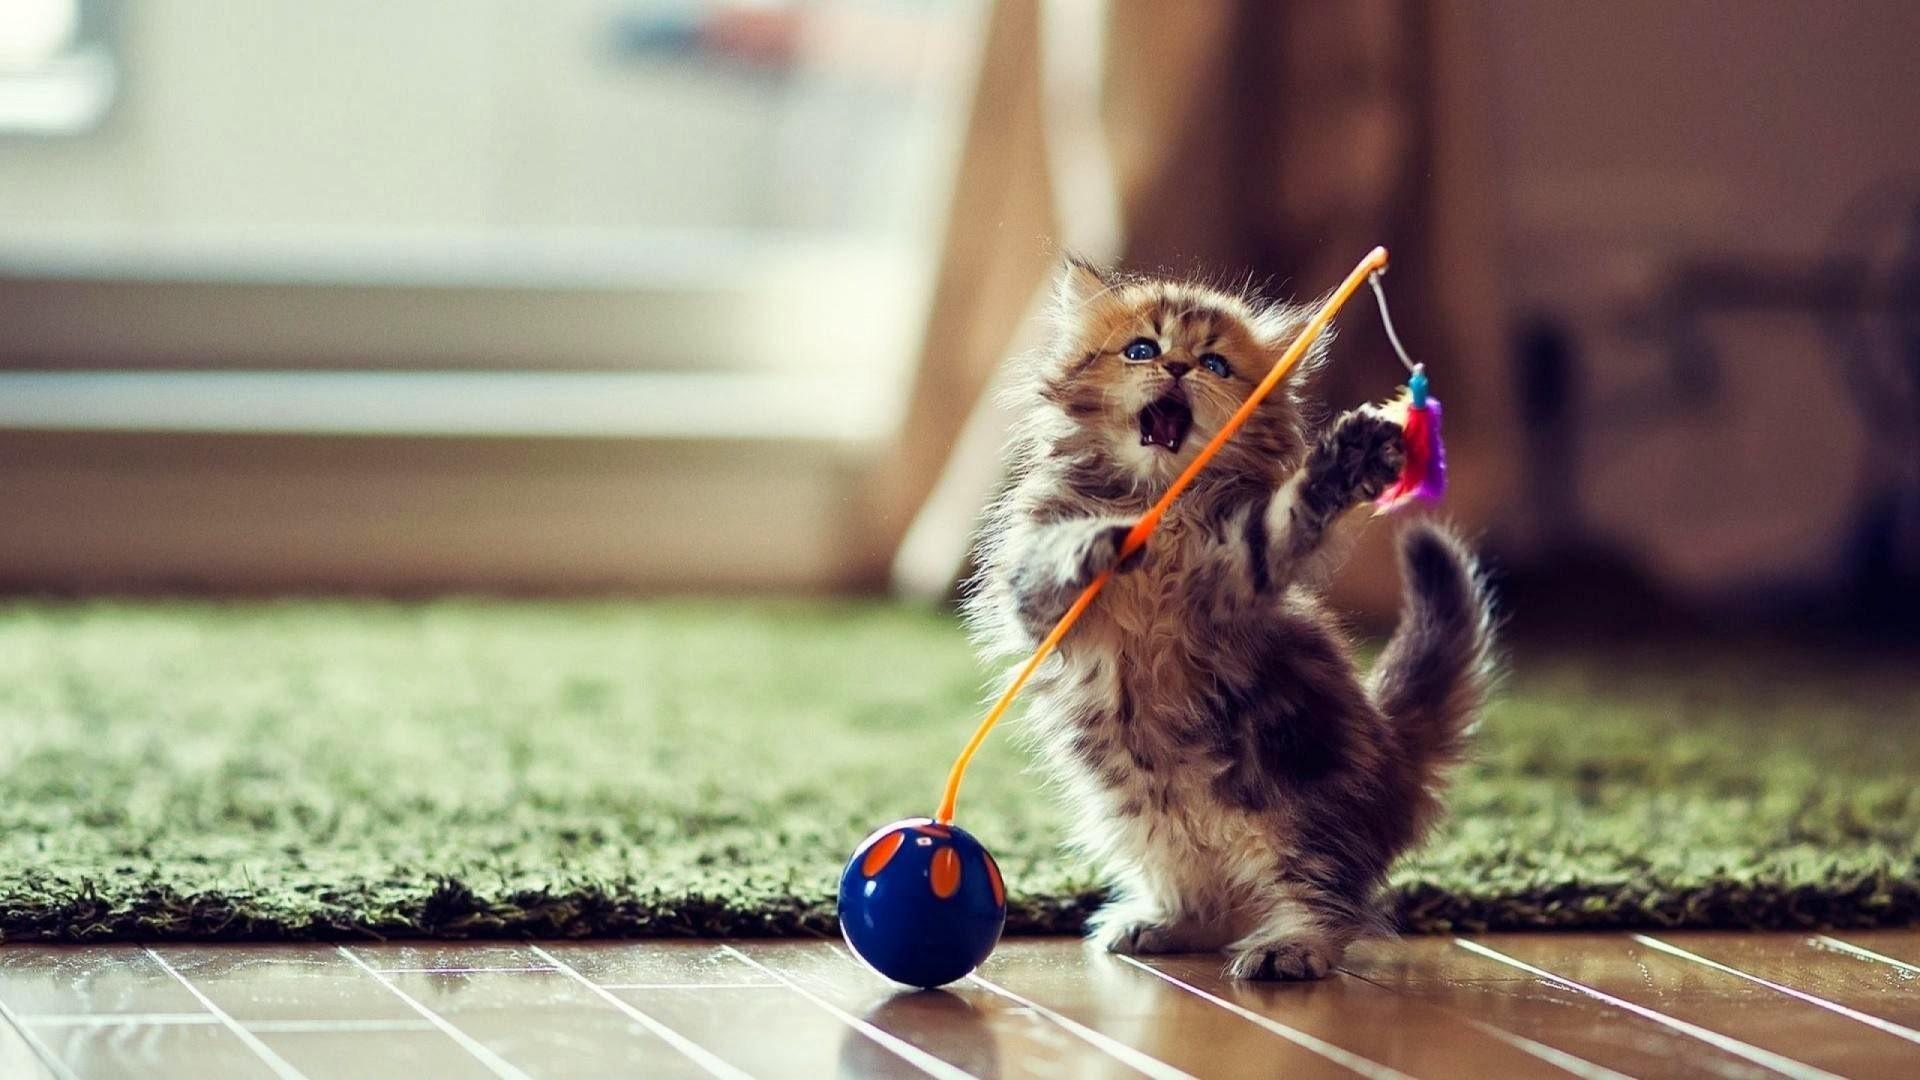 Funny-Cute-Cat-Playing-Wallpaper-Desktop-